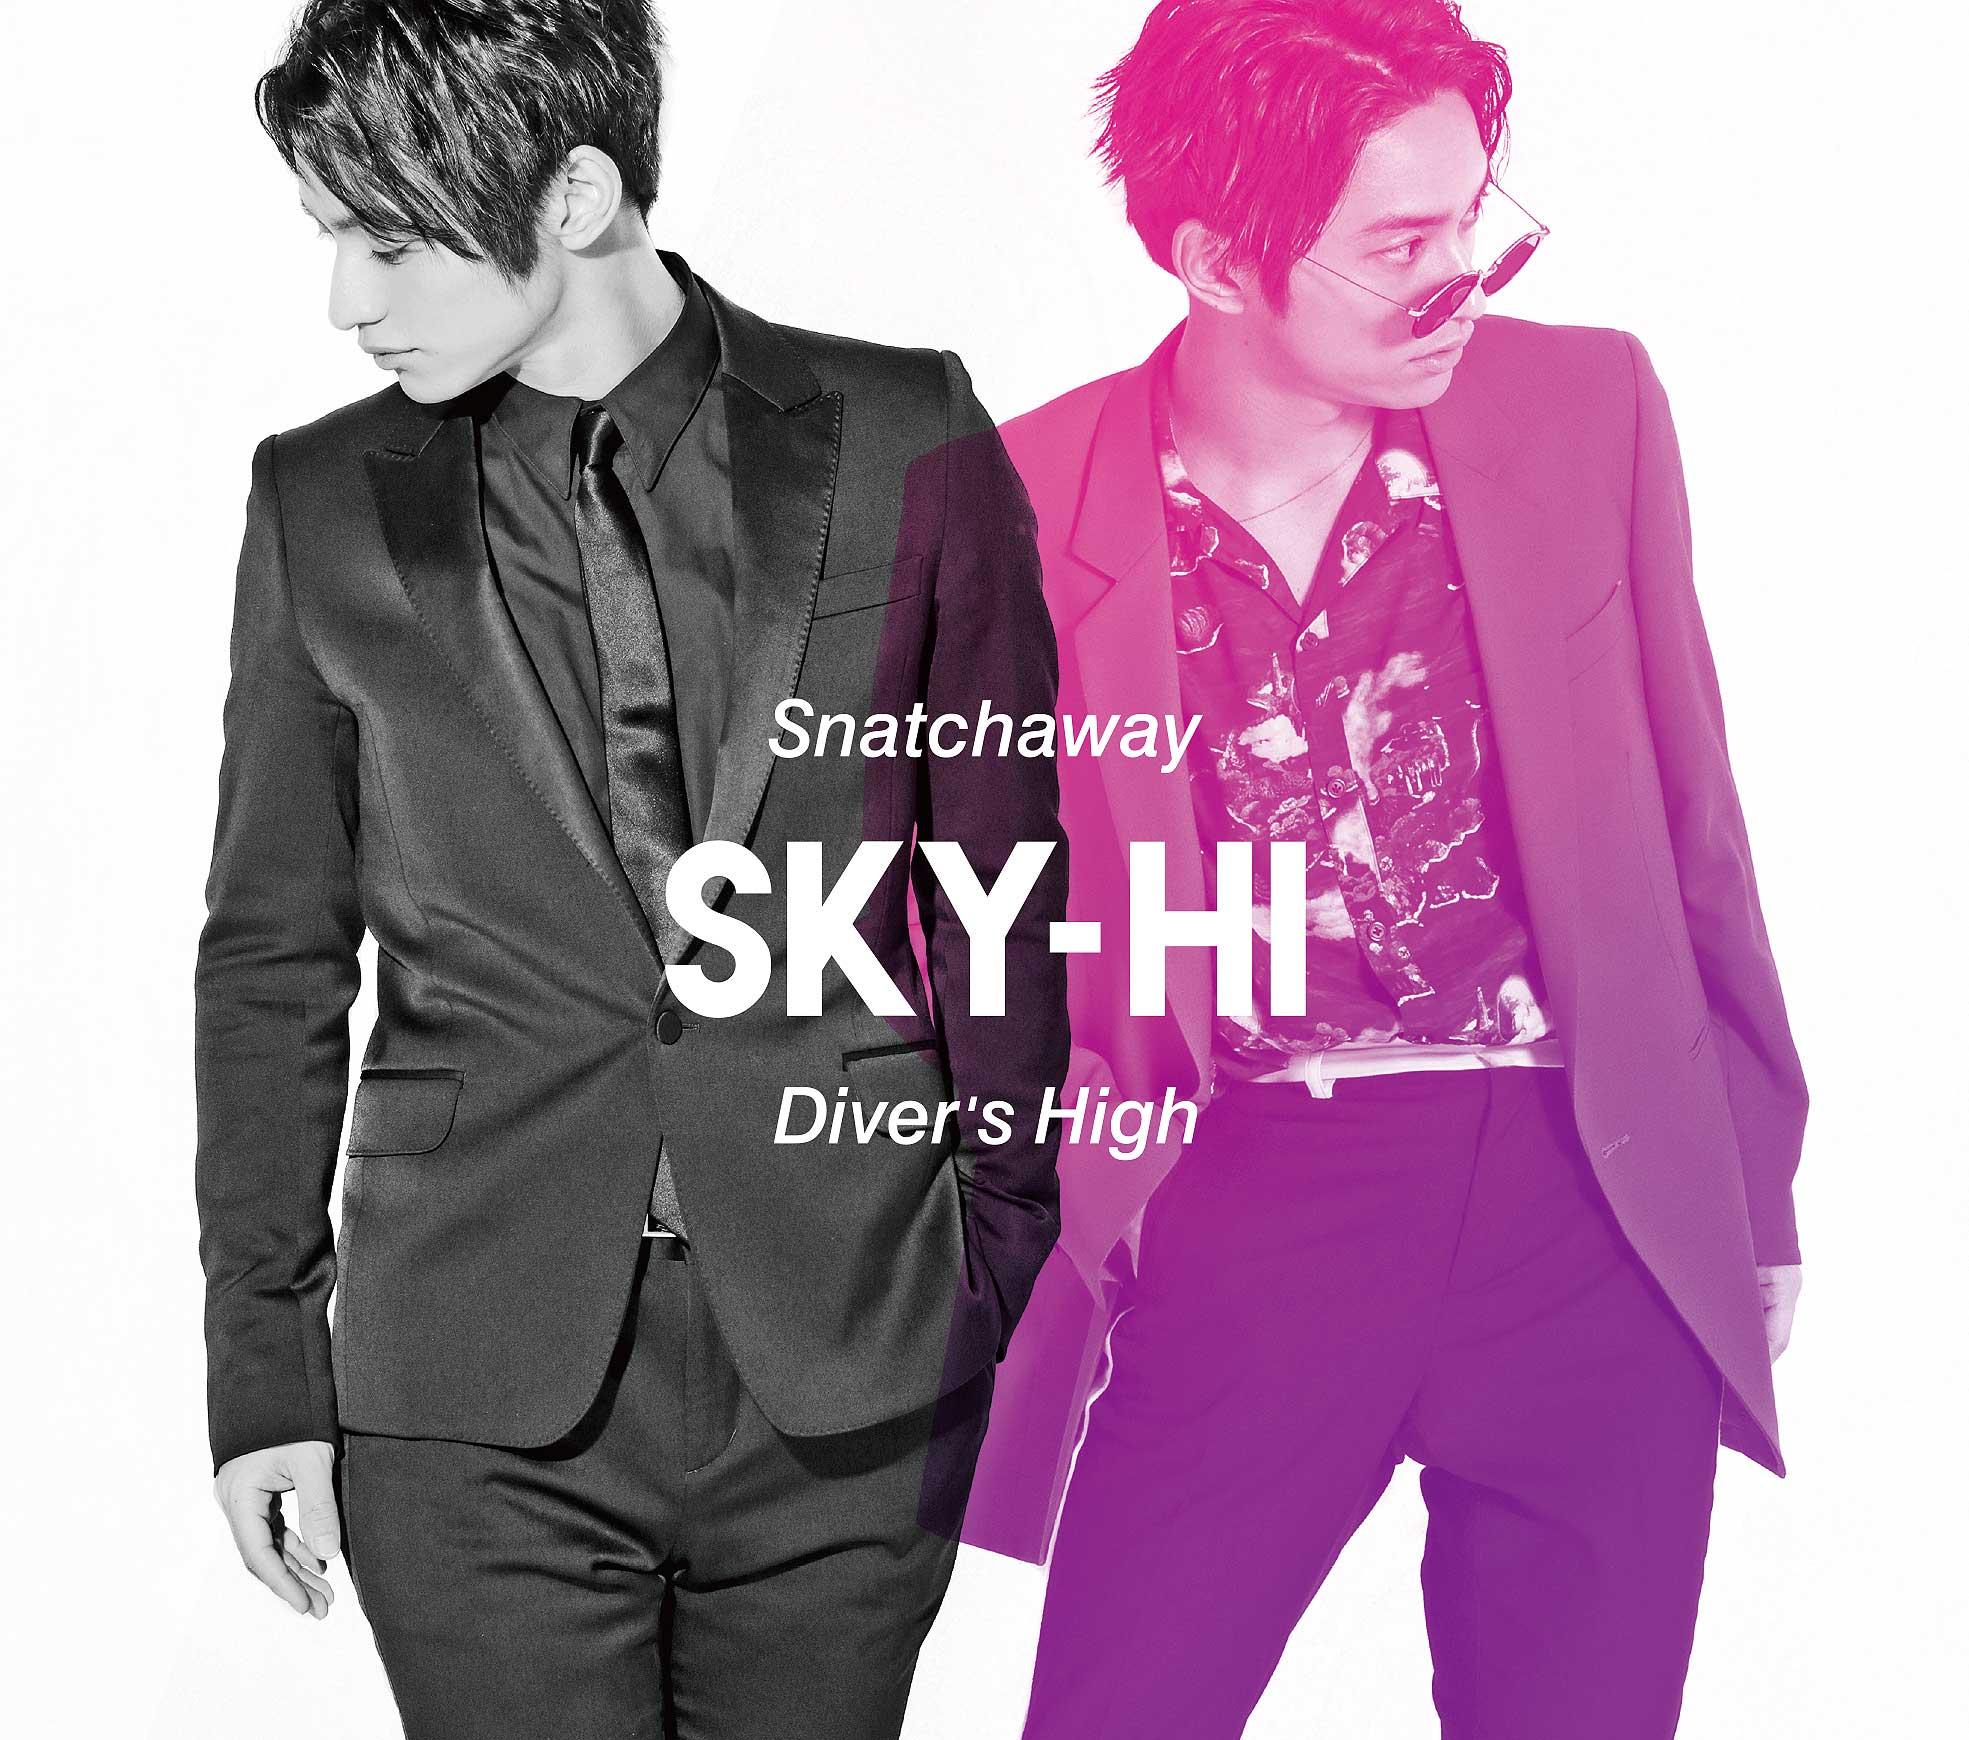 Snatchaway / Diver's High